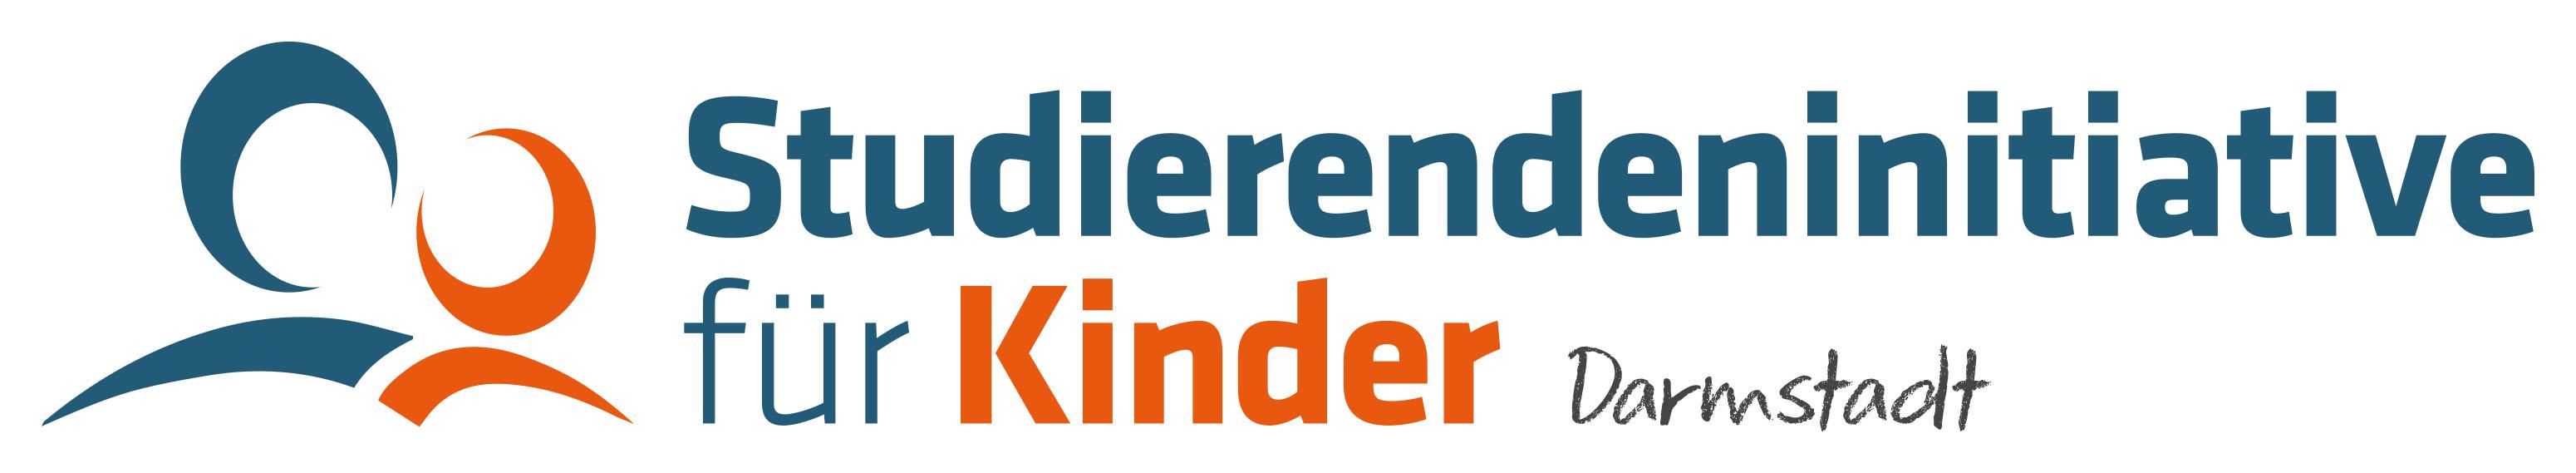 Studenteninitiative für Kinder Ortsgruppe Darmstadt e.V.